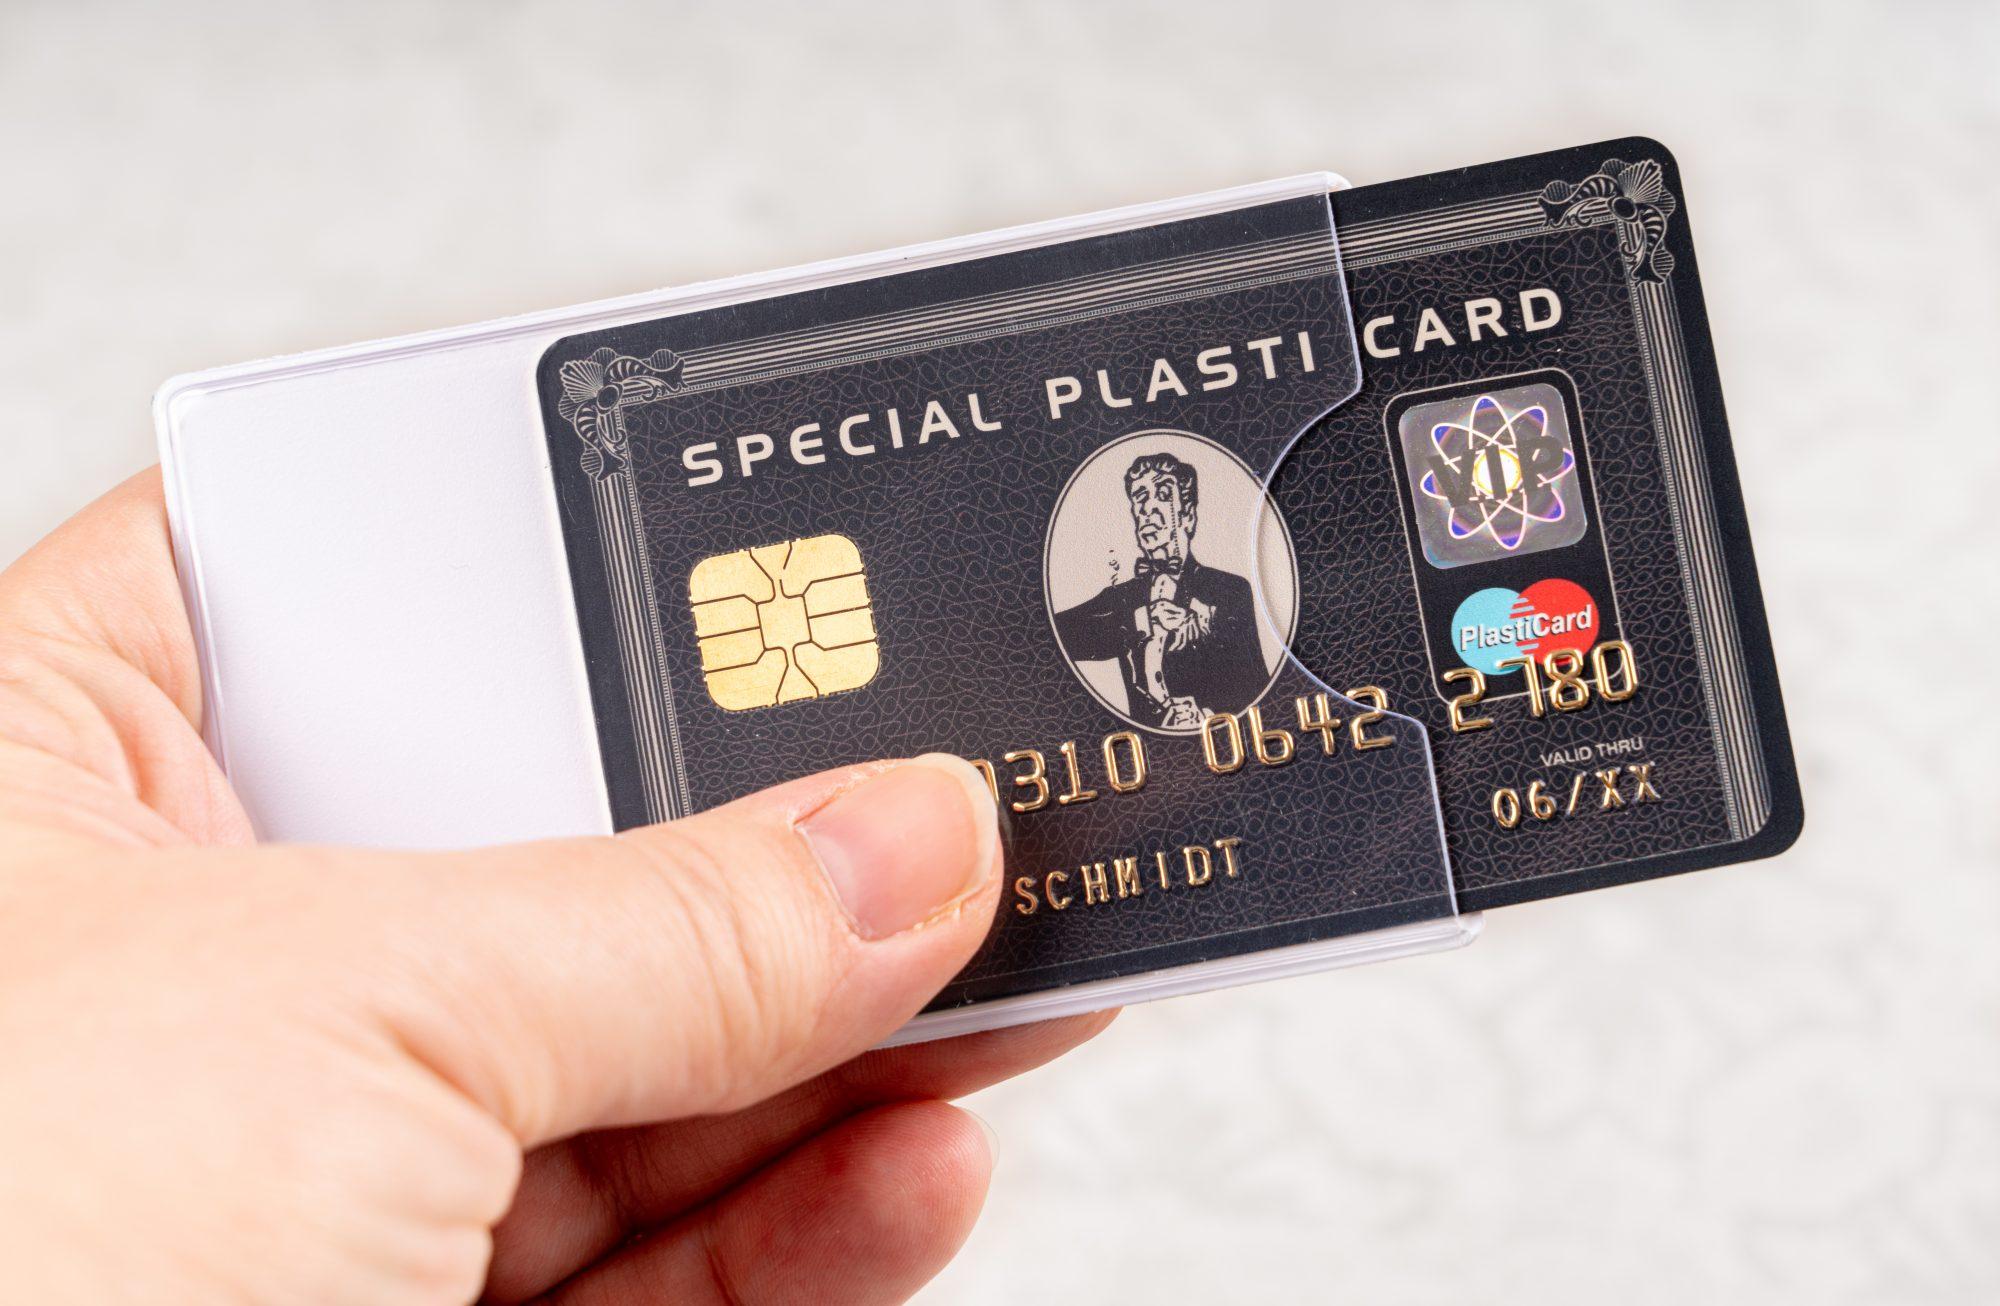 Kreditkarte in transparenter Schutzhülle aus Hart-PVC